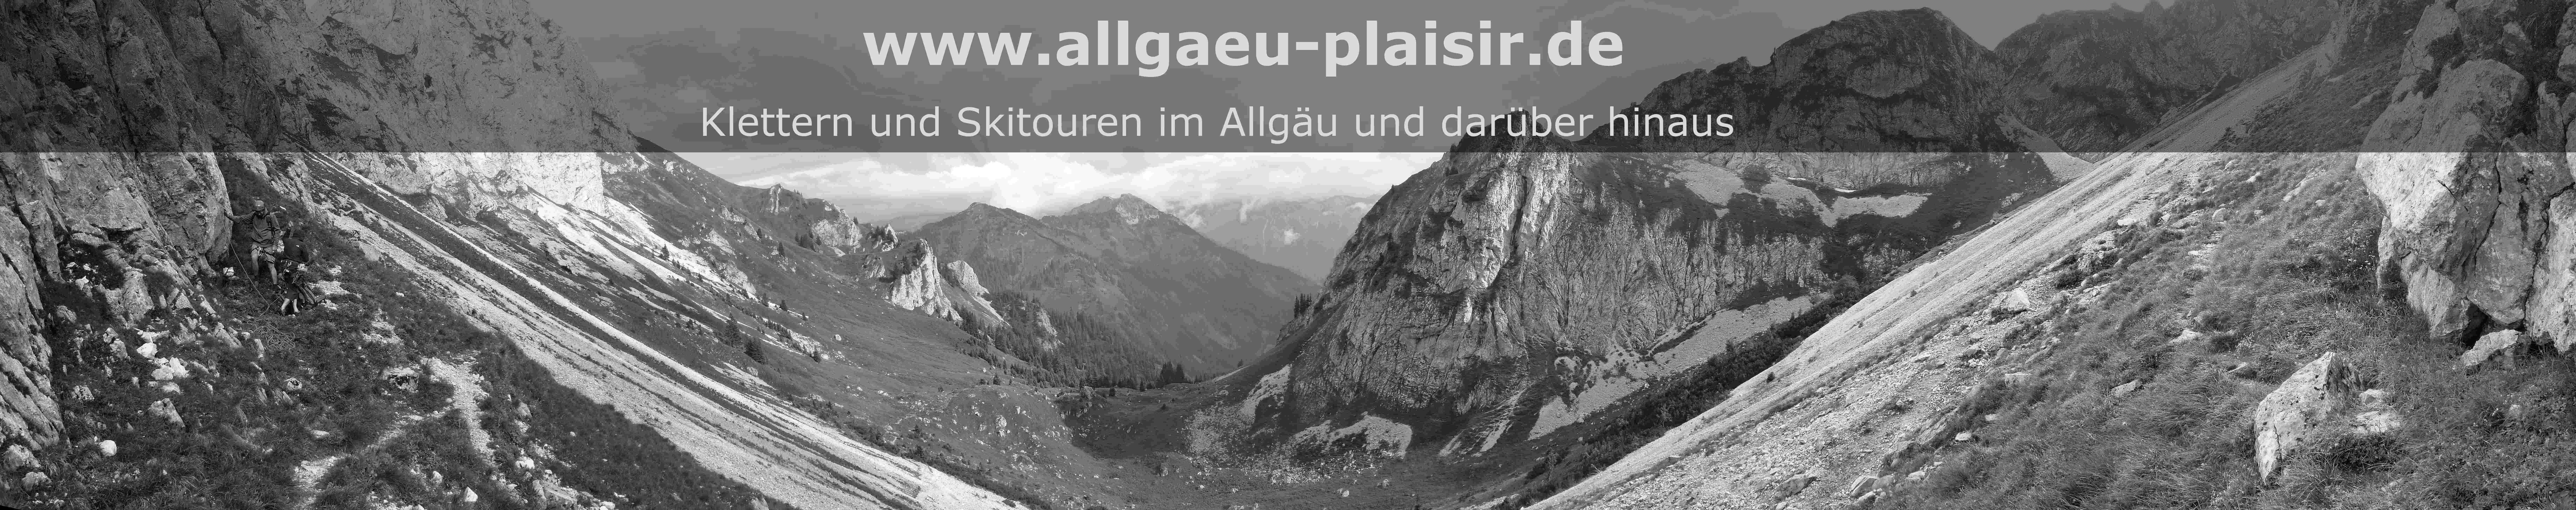 allgaeu-plaisir.de